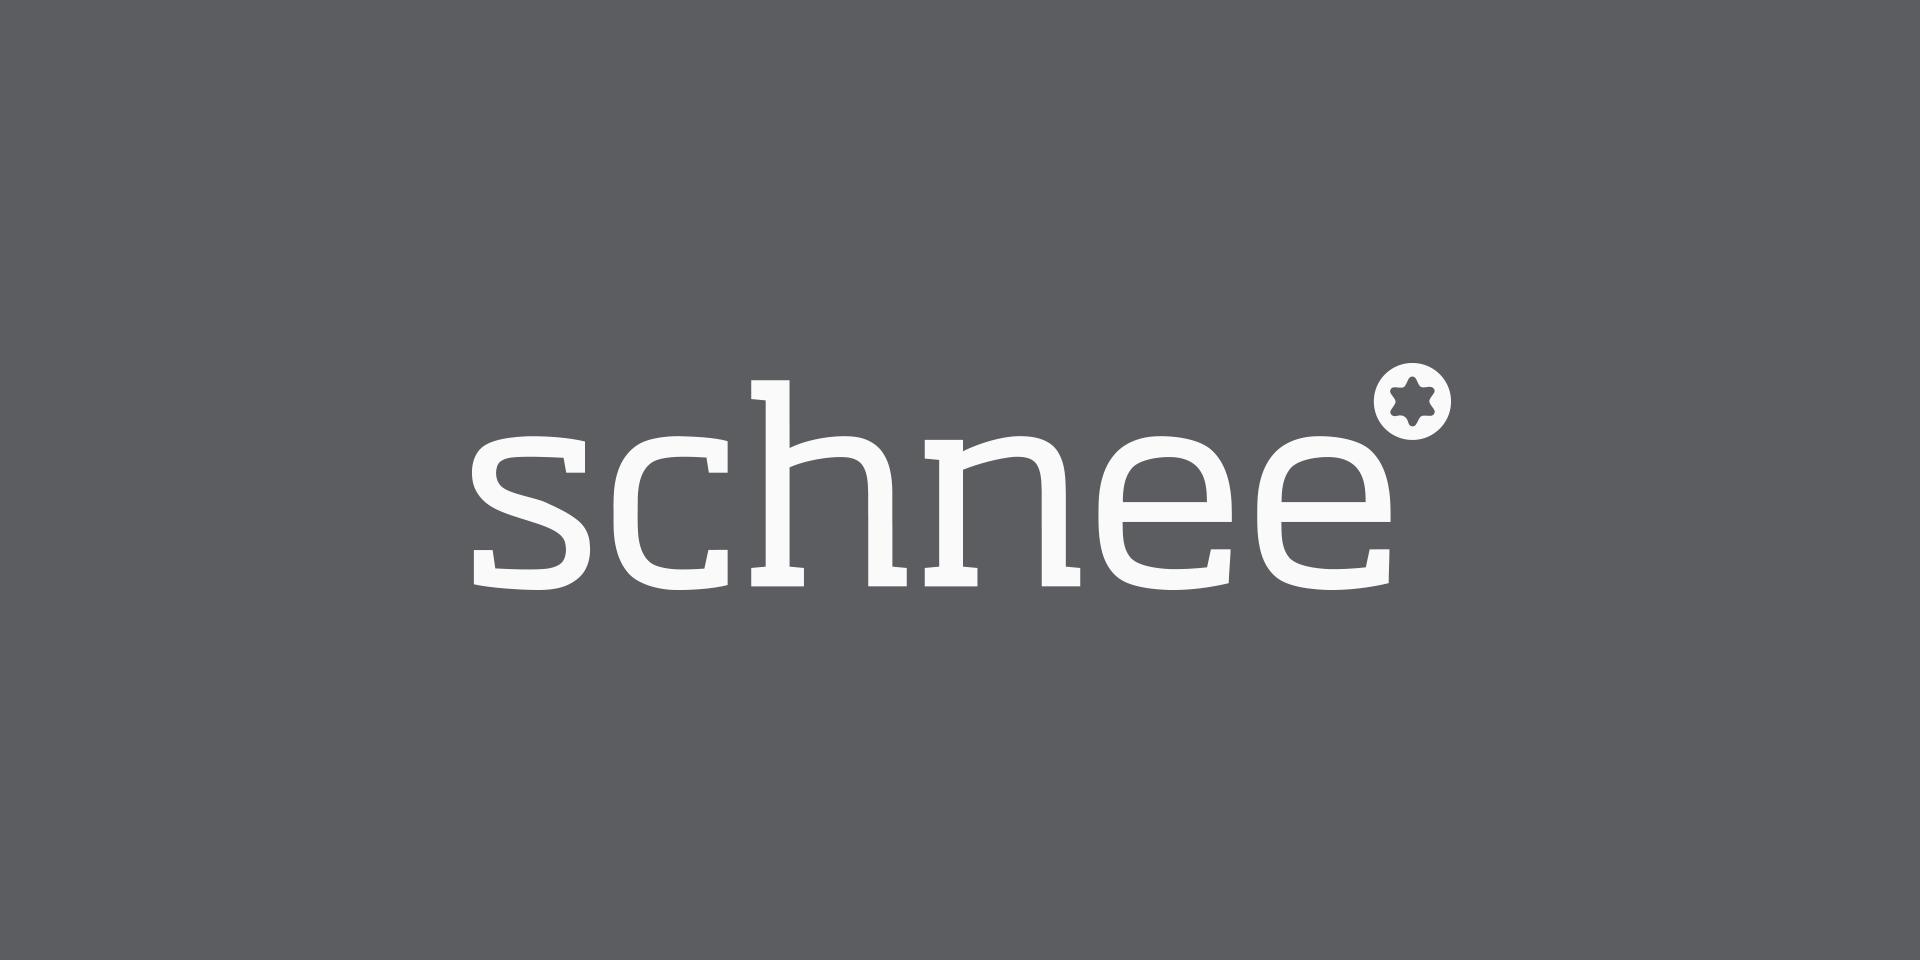 Logoentwicklung / Logodesign von André Morre Grafik-Design